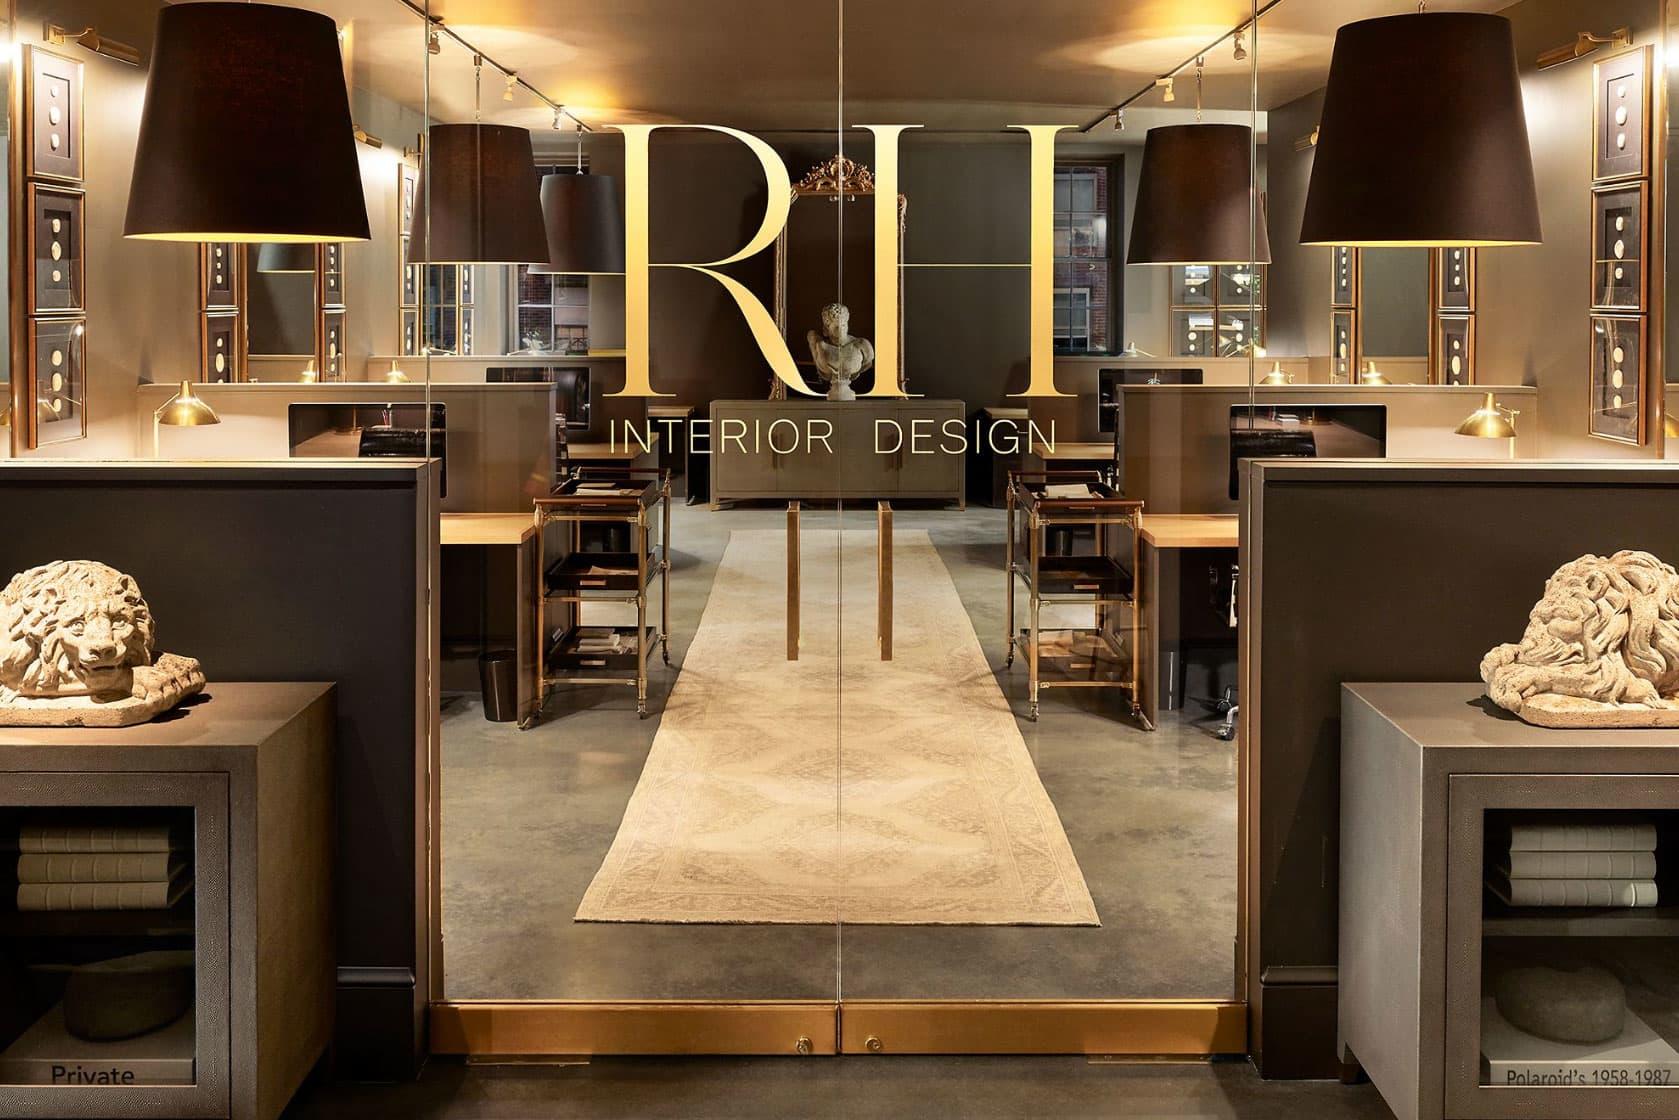 RH, Signet Jewelers, GameStop & more